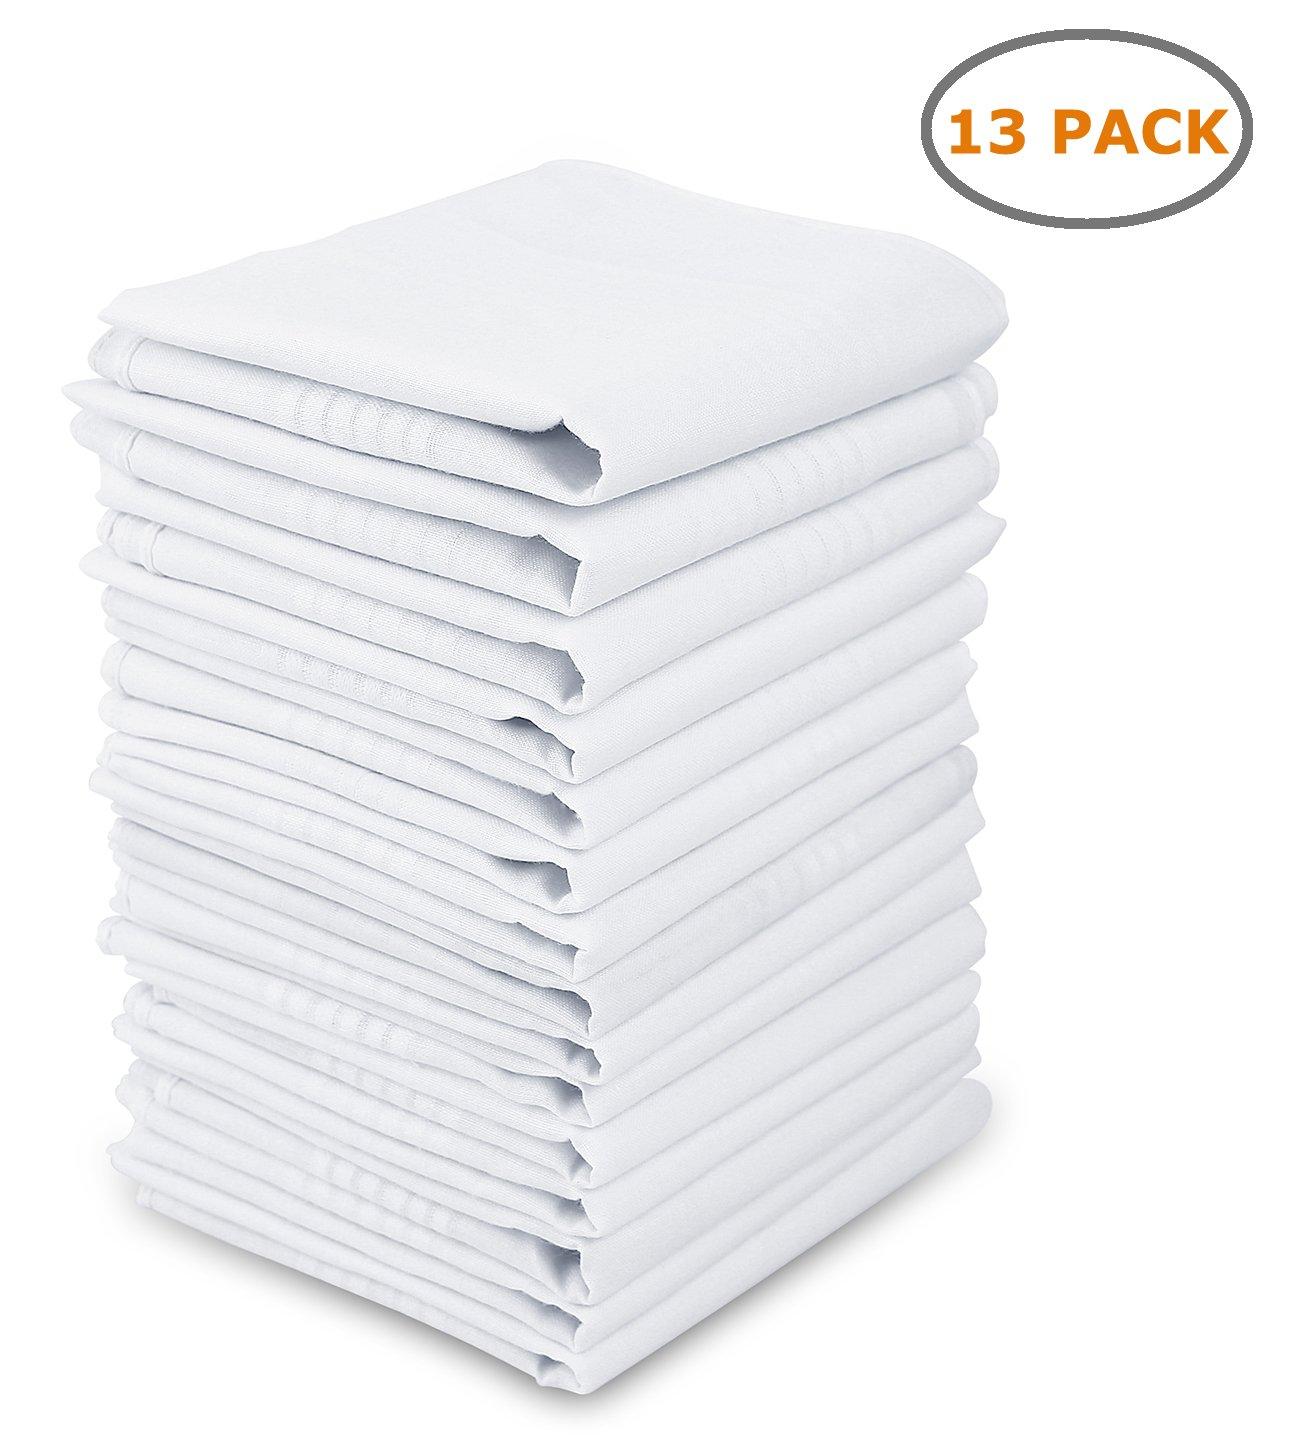 Ohuhu Cotton Handkerchiefs Solid White Lightweight 13 Pack